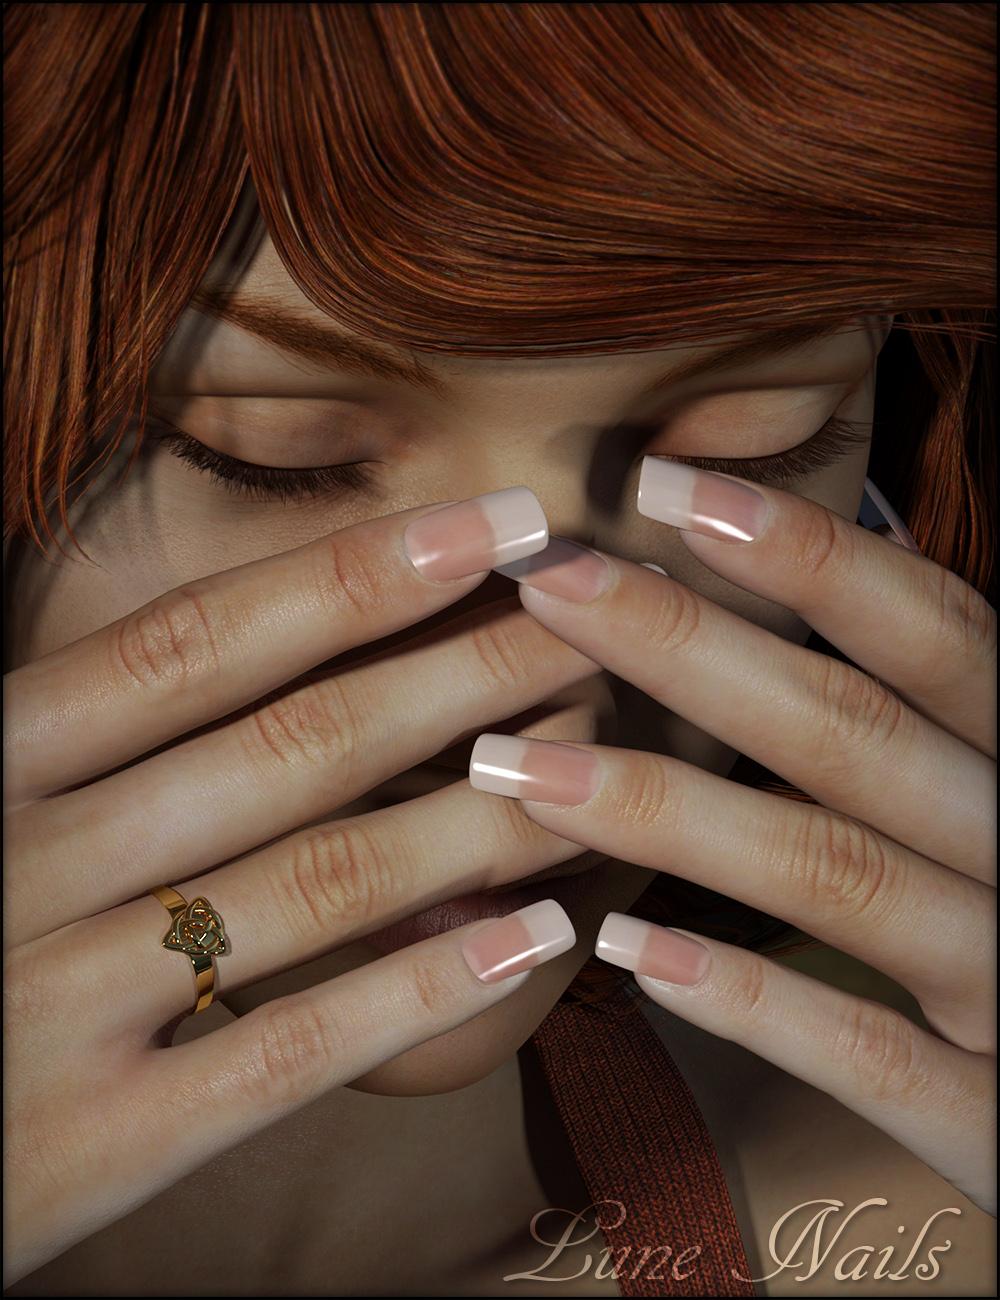 Lune Nails for Genesis 3 Female(s) by: Fisty & DarcFred Winkler ArtSabby, 3D Models by Daz 3D